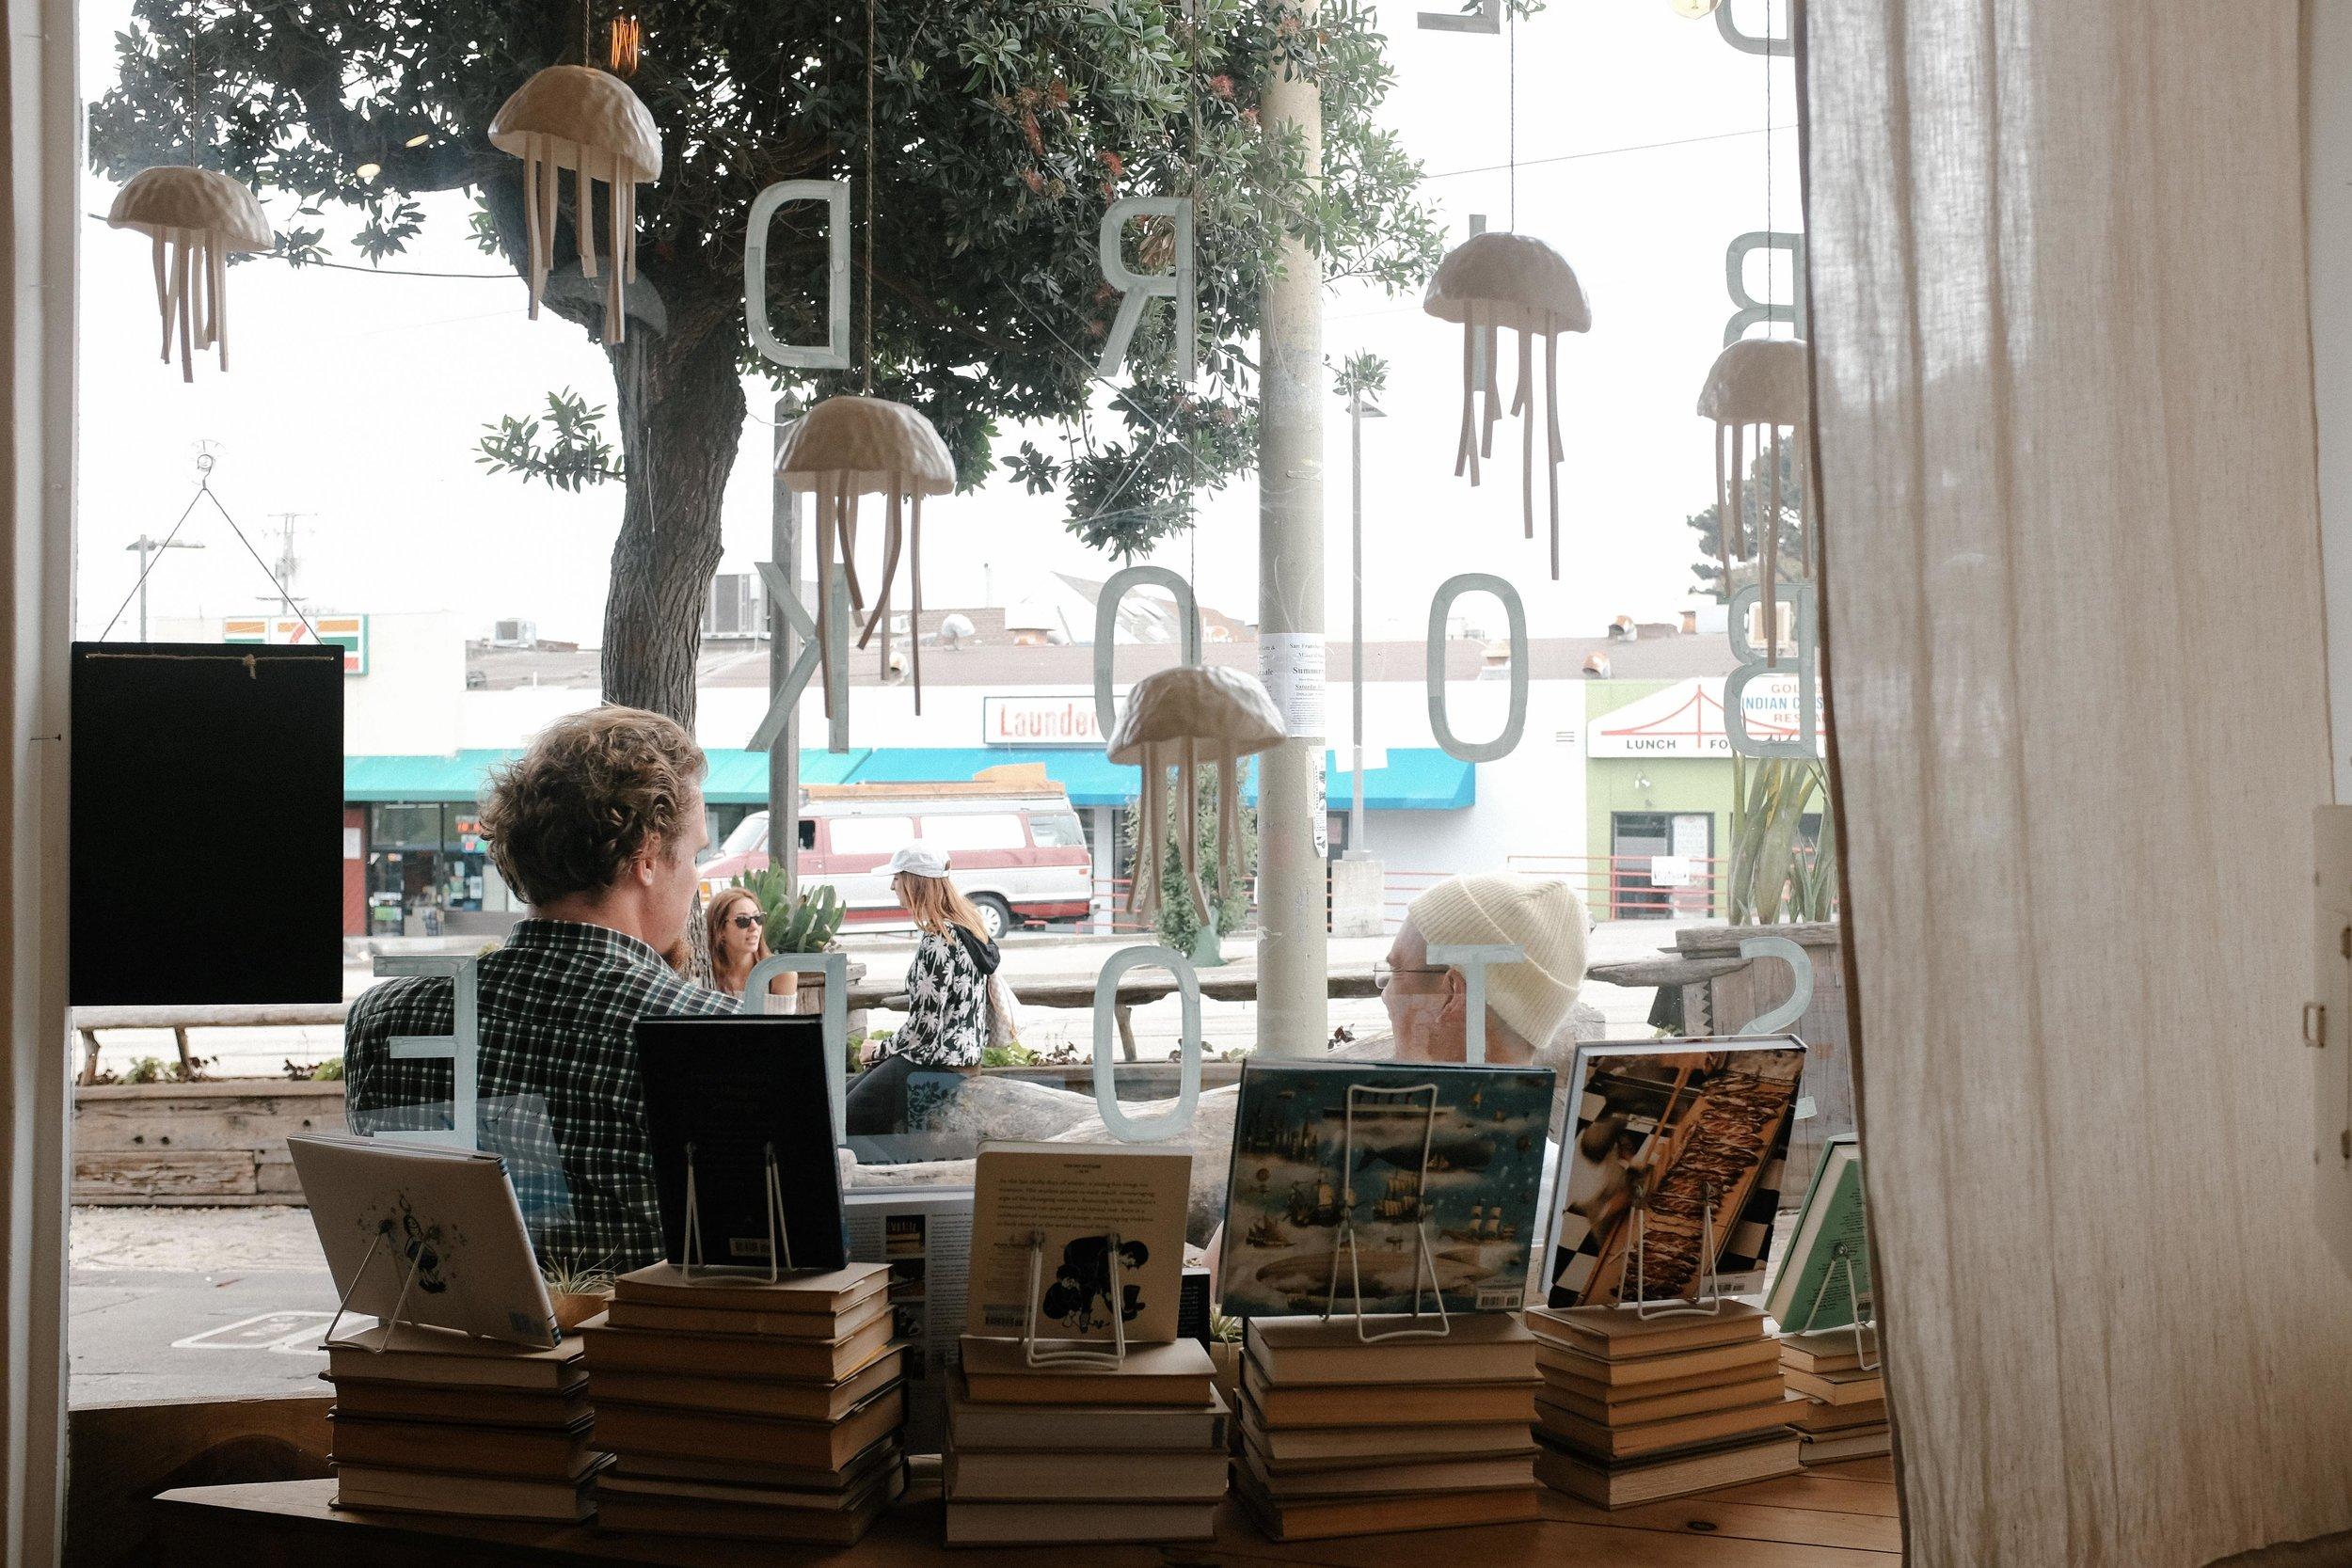 window display by  satchel rye